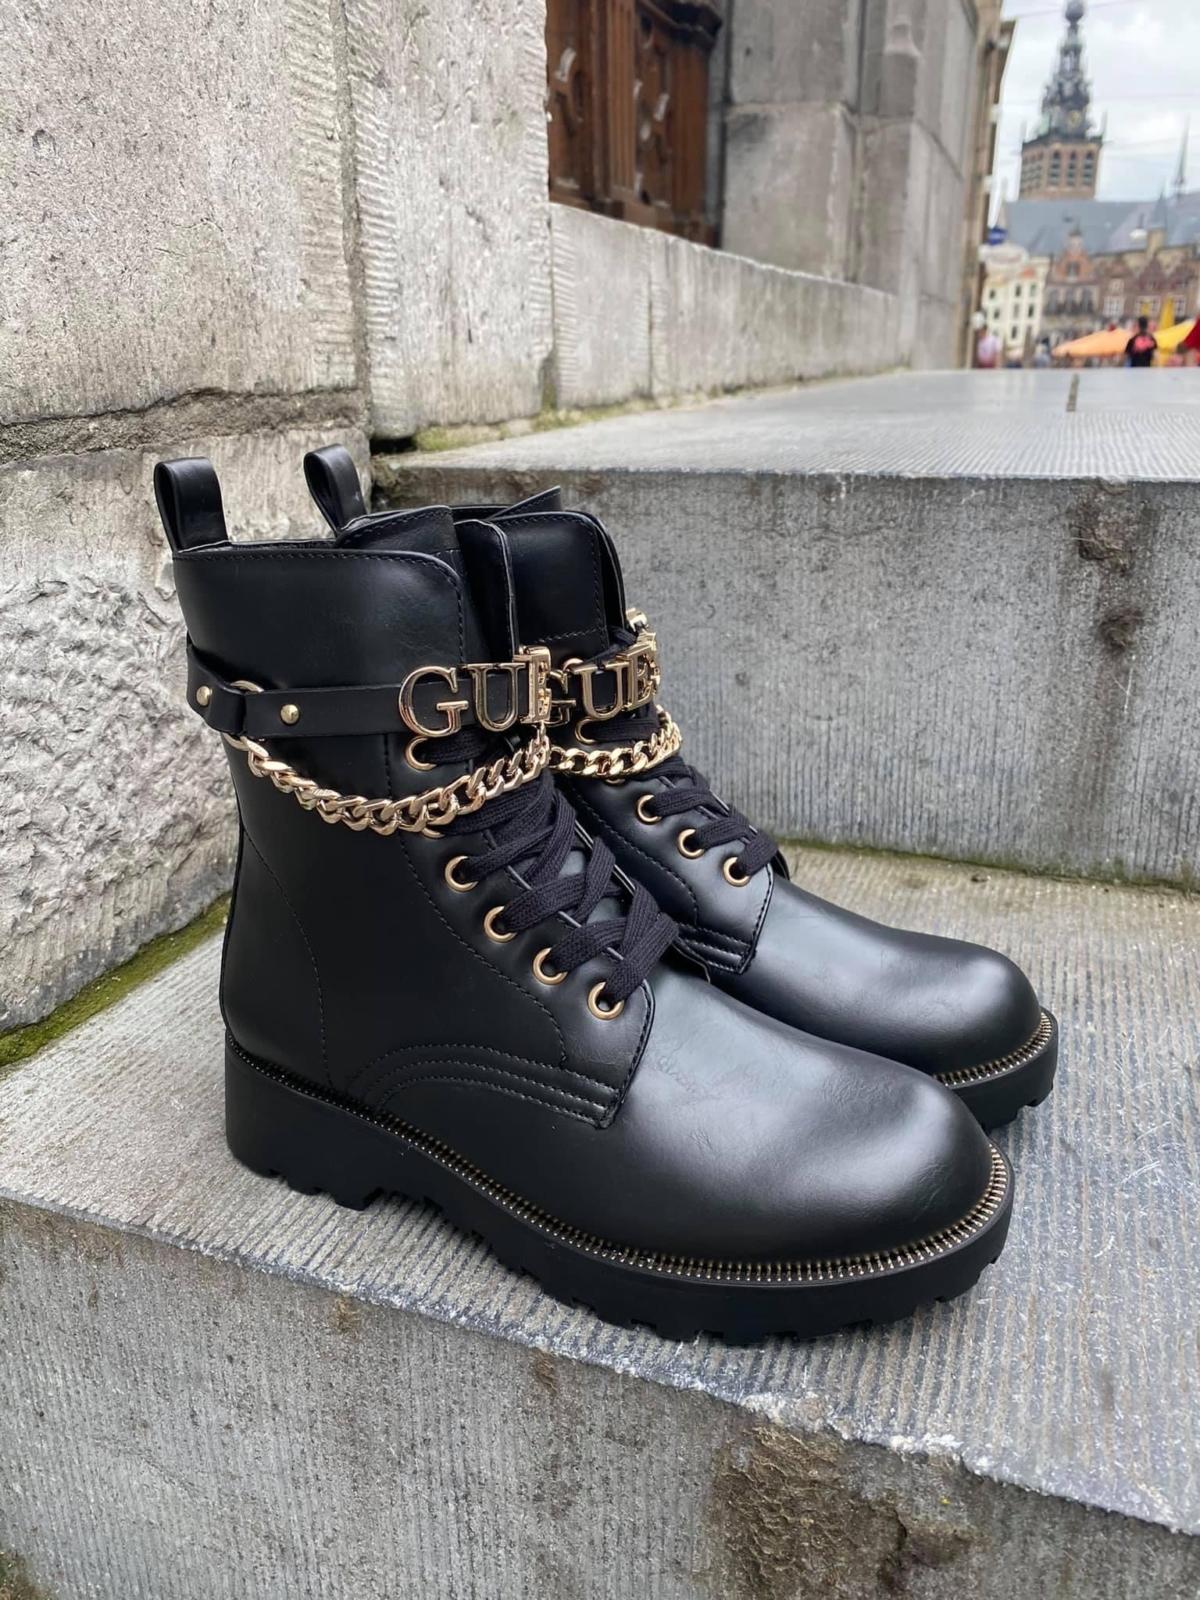 Guess boots met GUESS riempje New